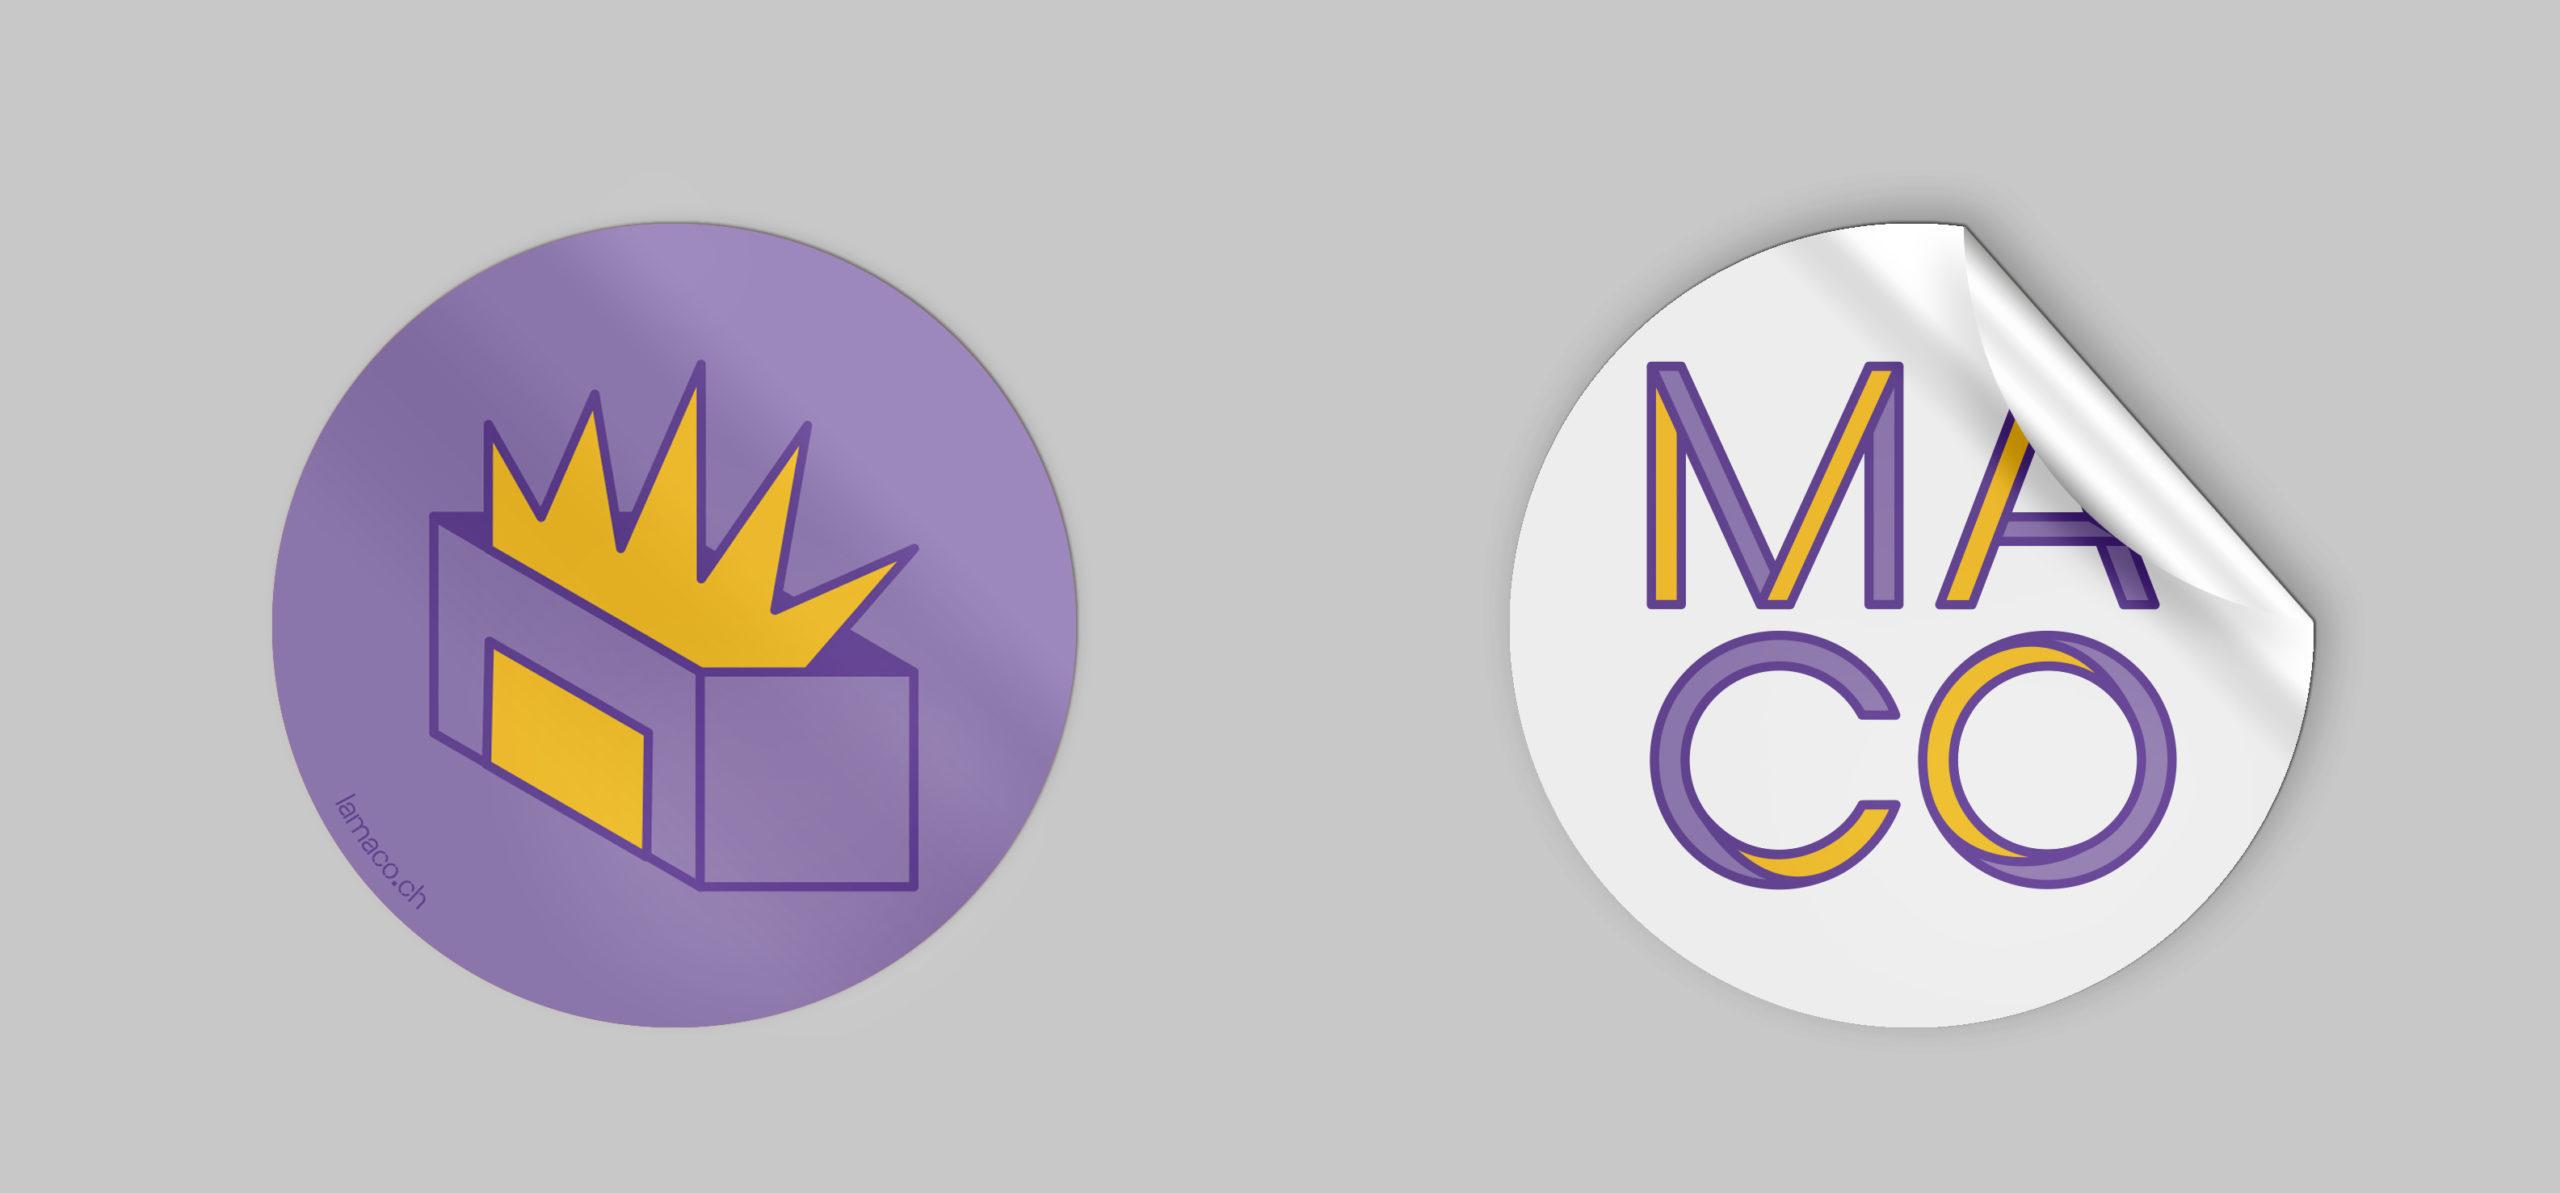 MACO_Stickers